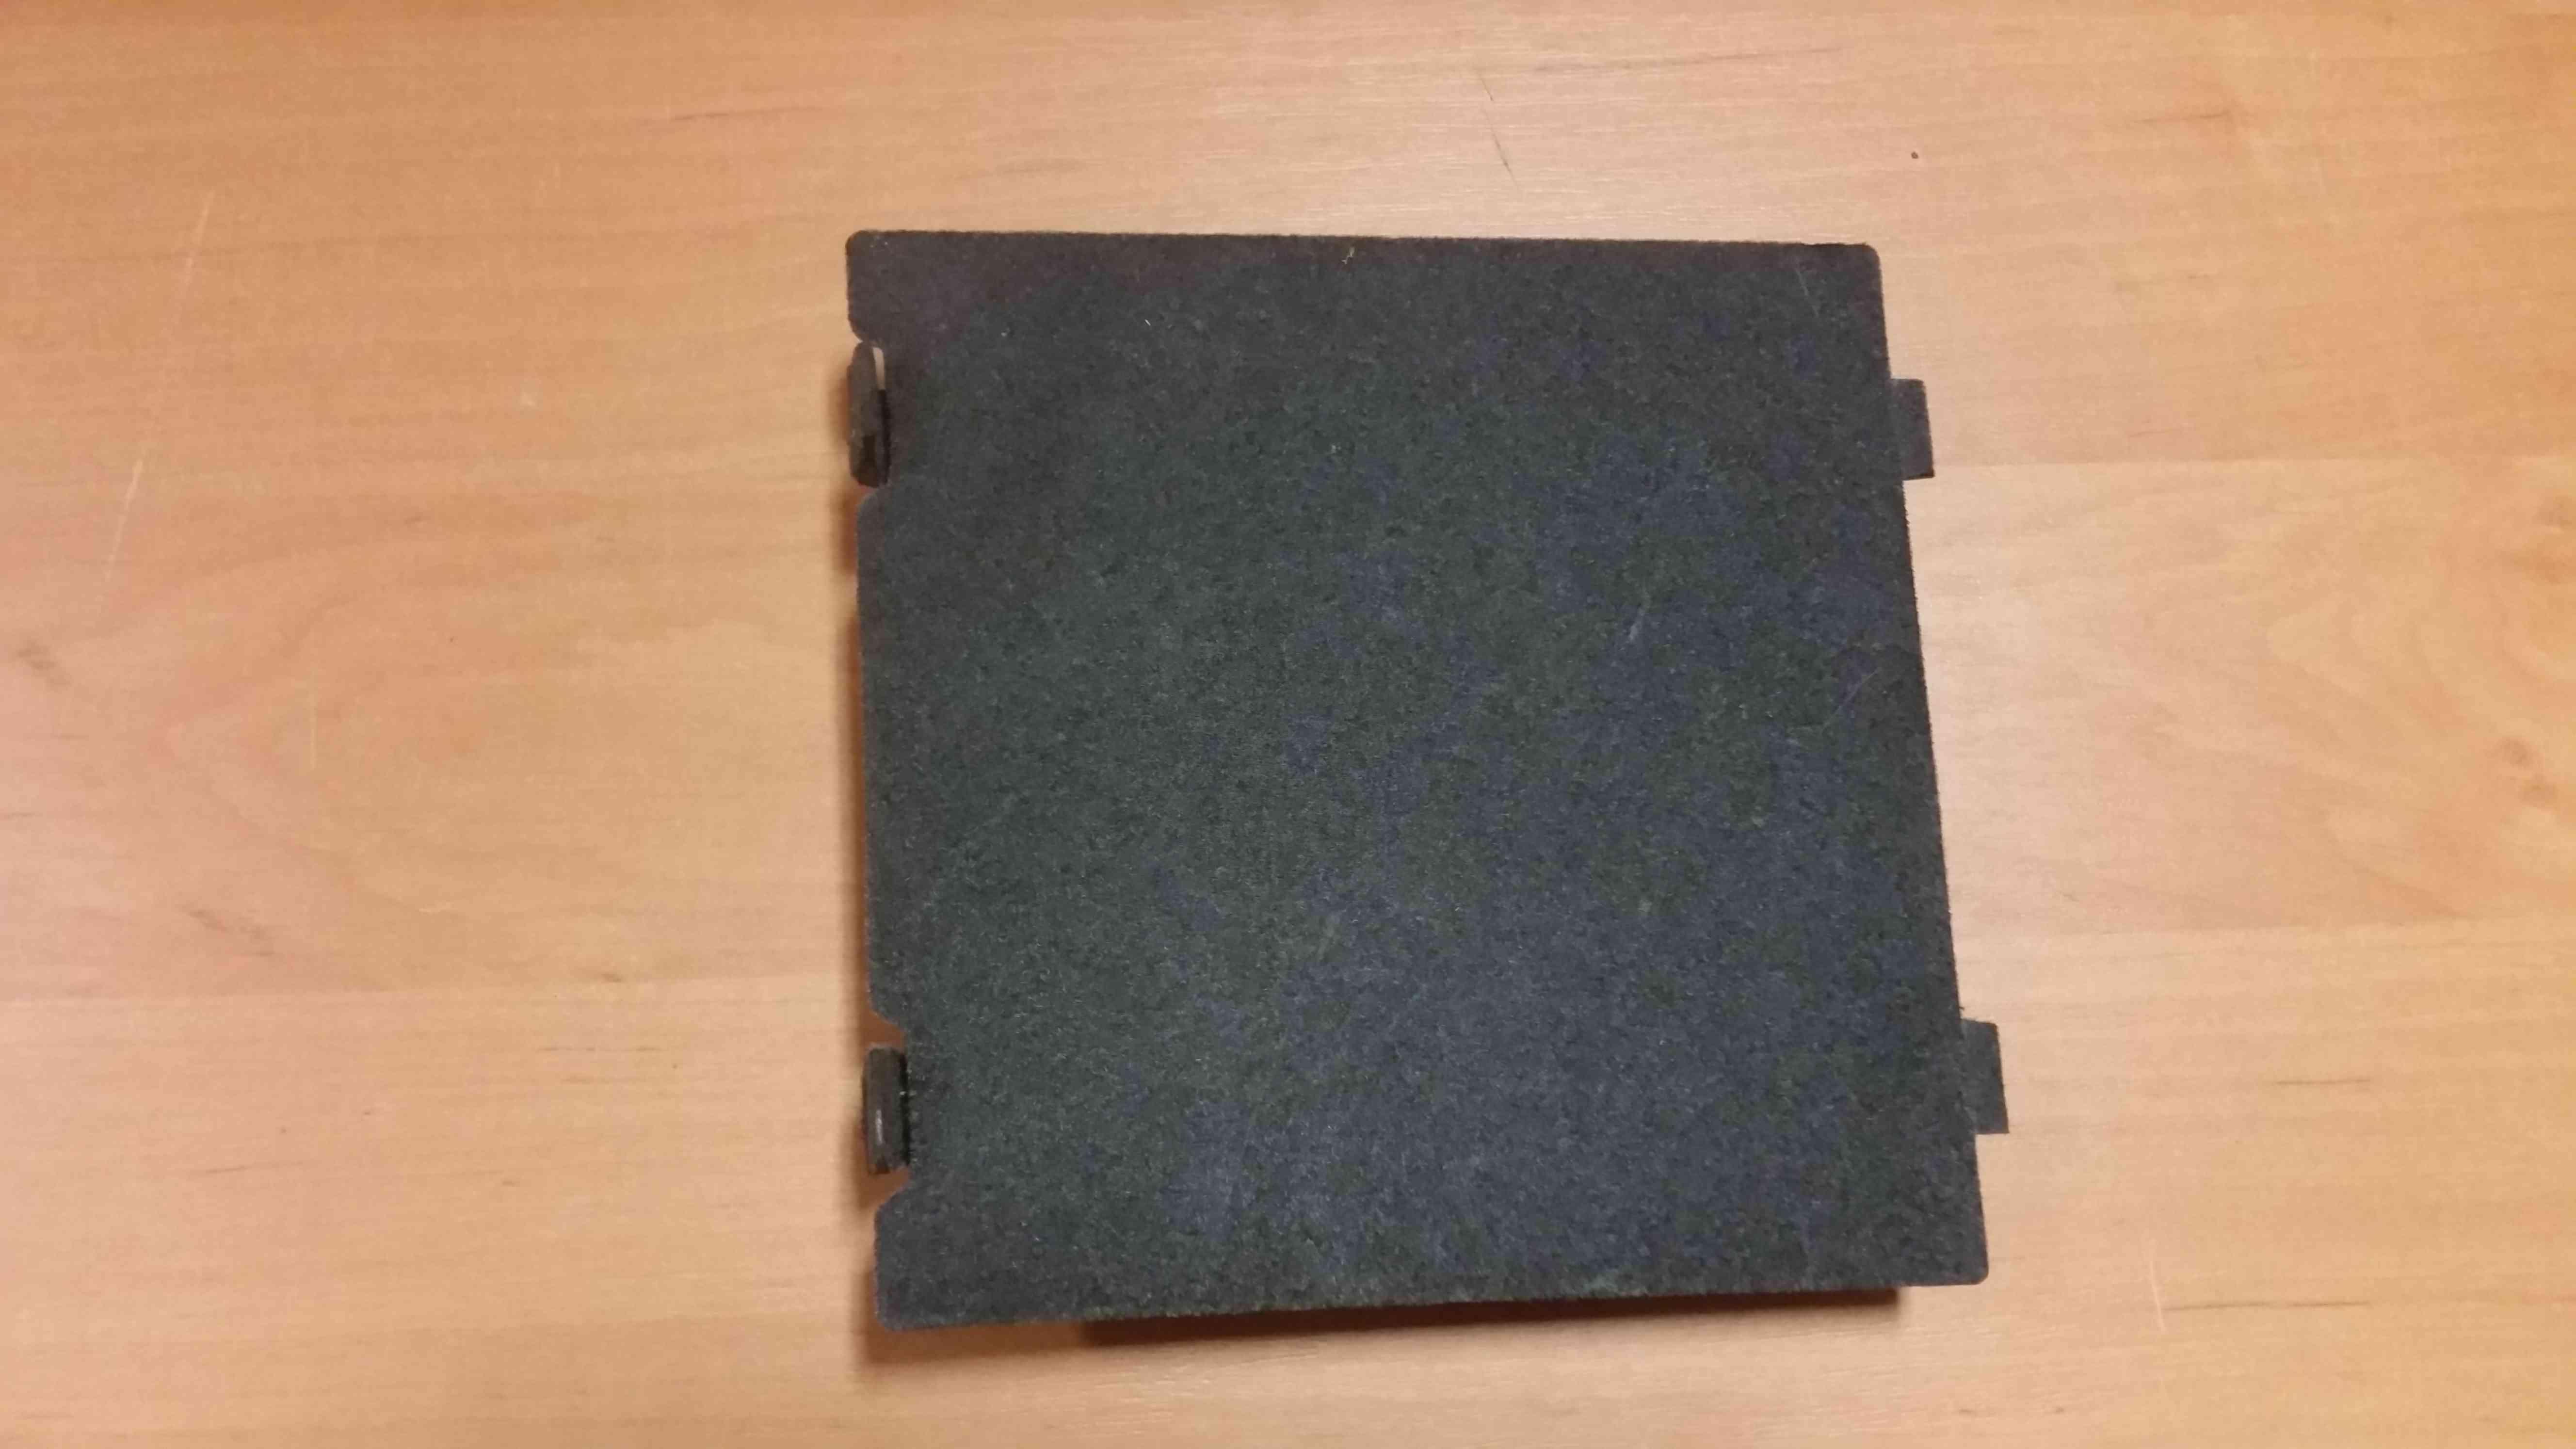 Peugeot 407 Rhd Glove Box Fuse Holder Trim 9647987677 Location Article